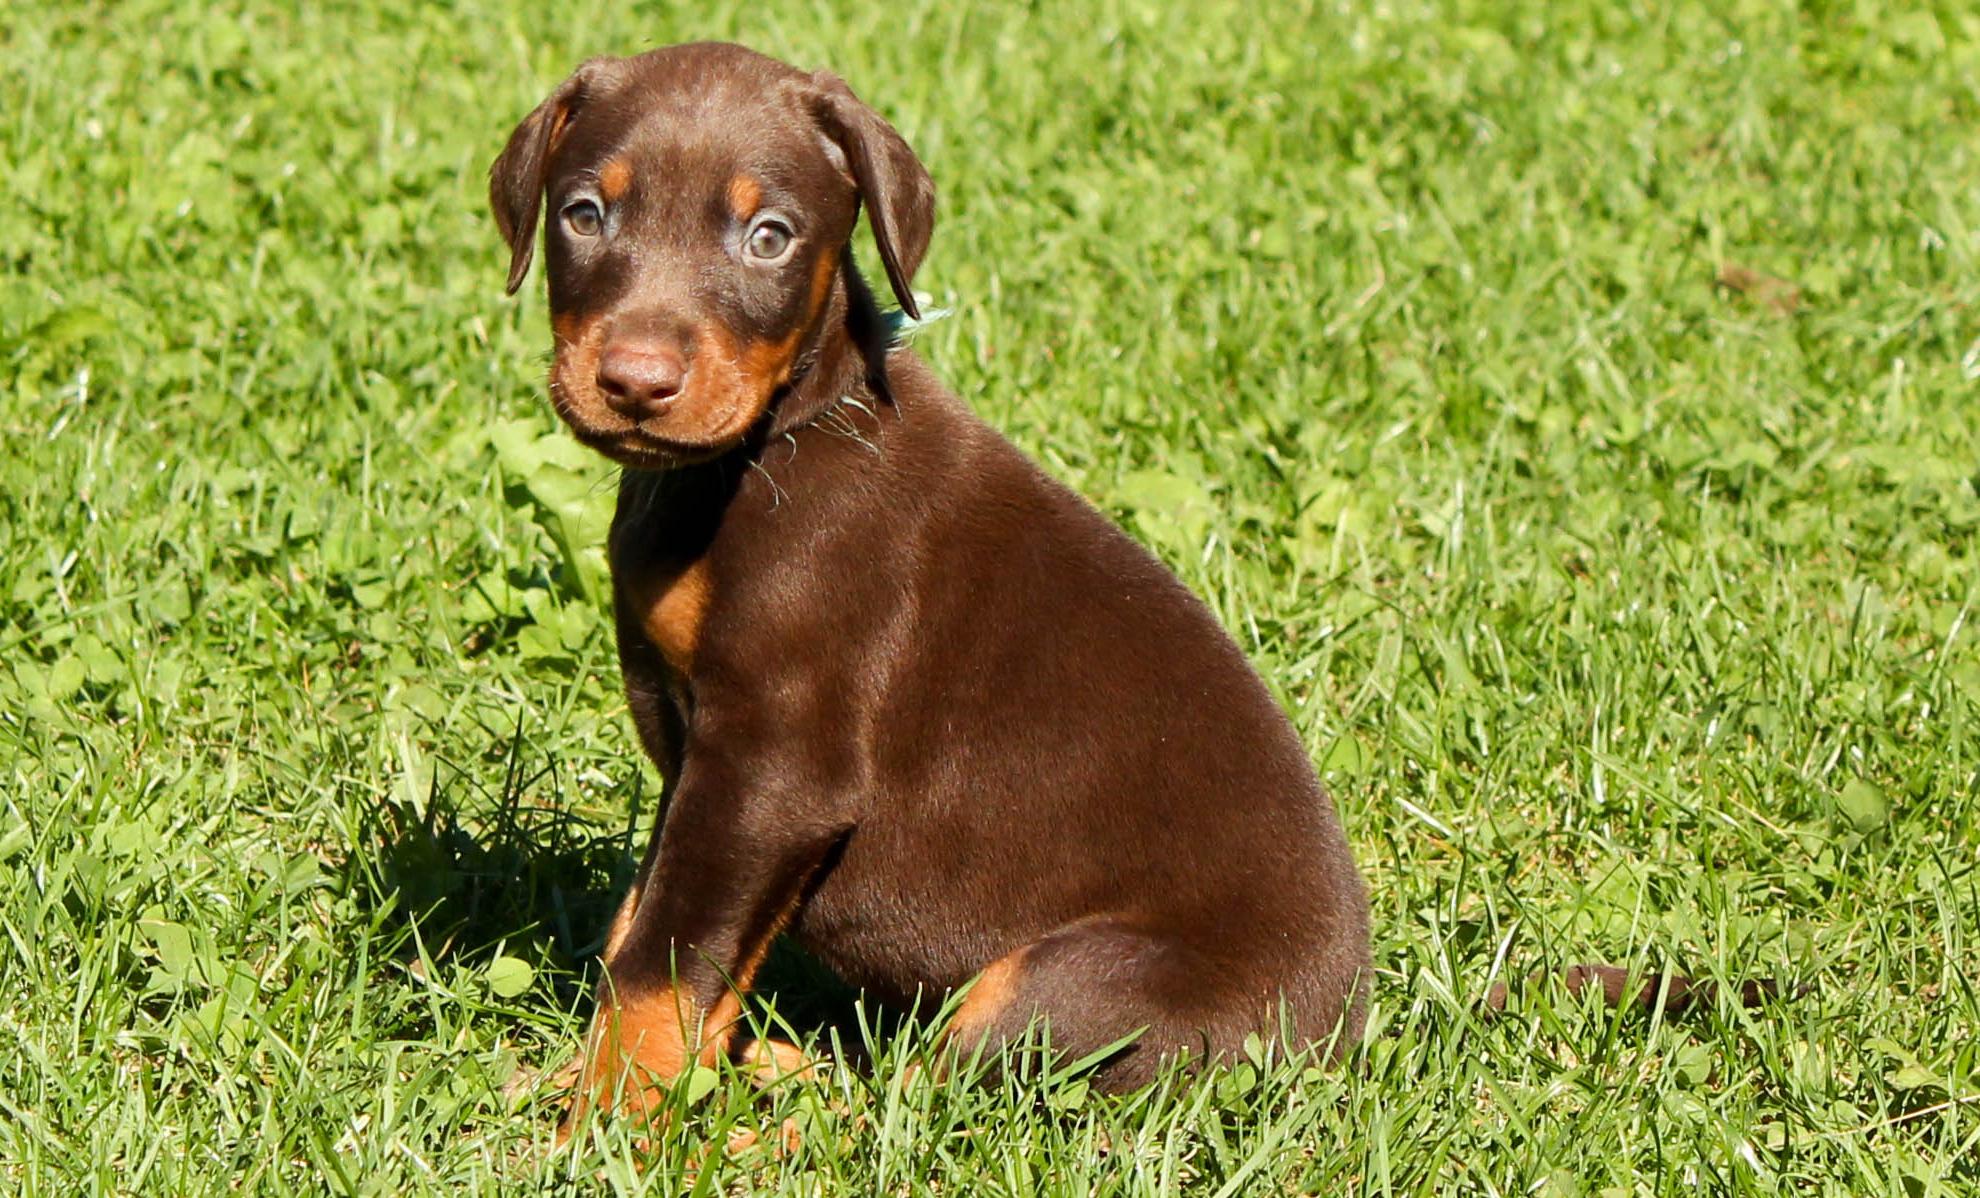 Similar Dogs Like A Patterdale Terrier